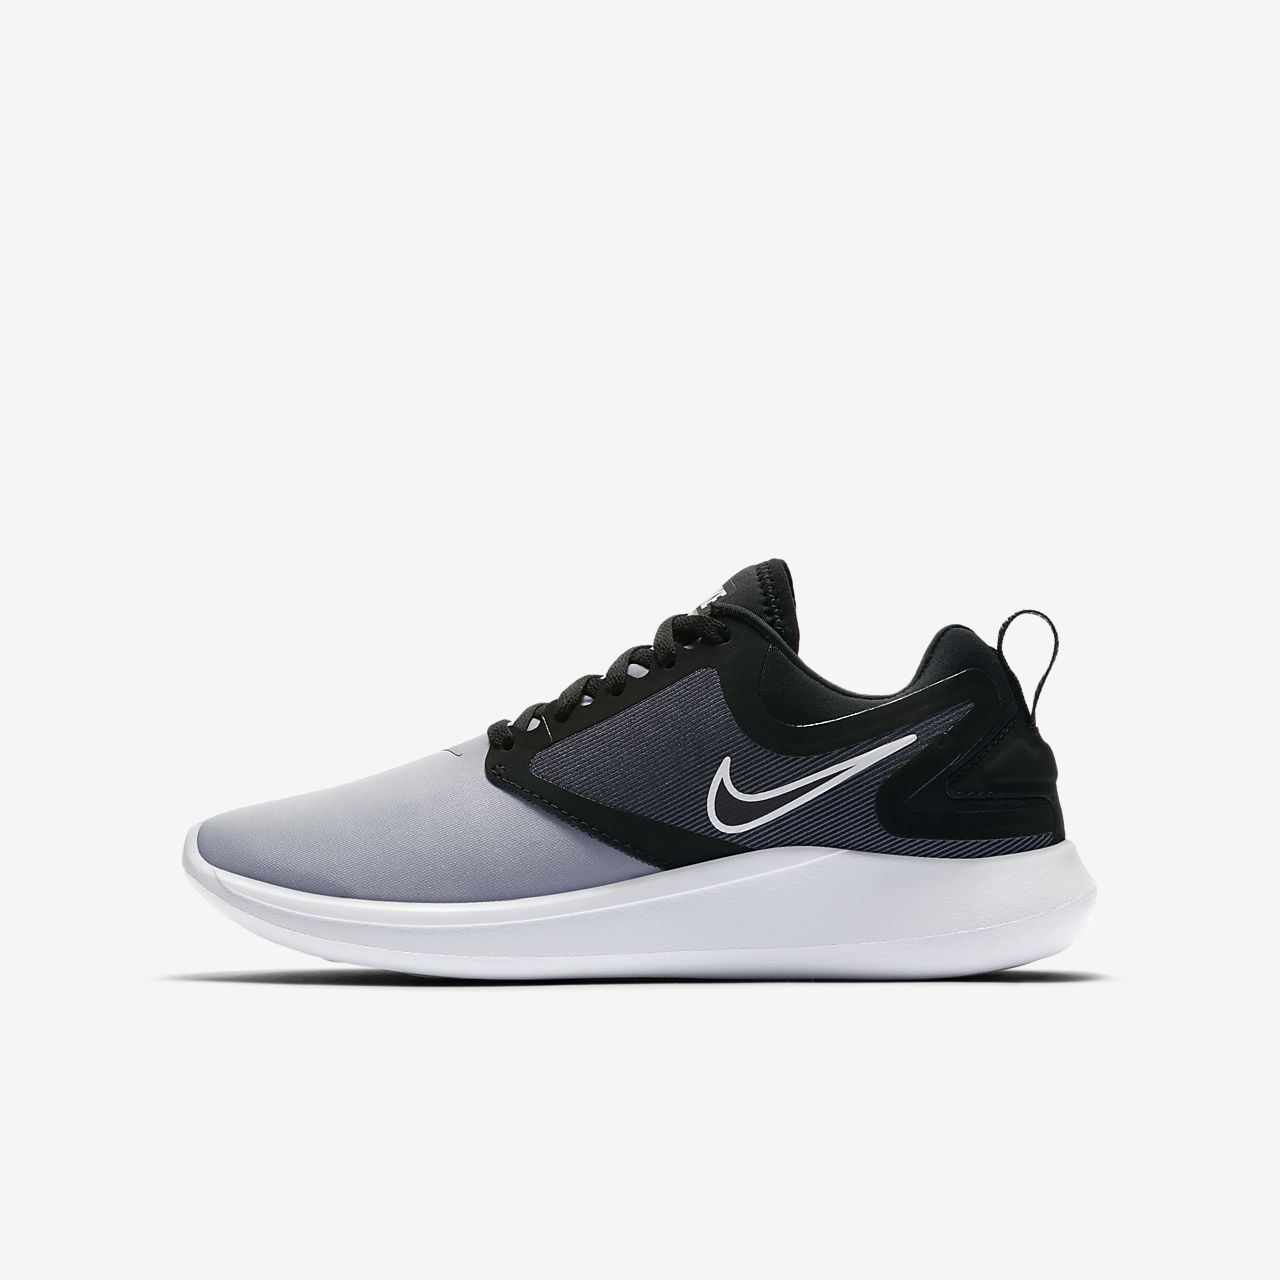 Nike LunarSolo Girls Running Shoes Black/White hH5062Z